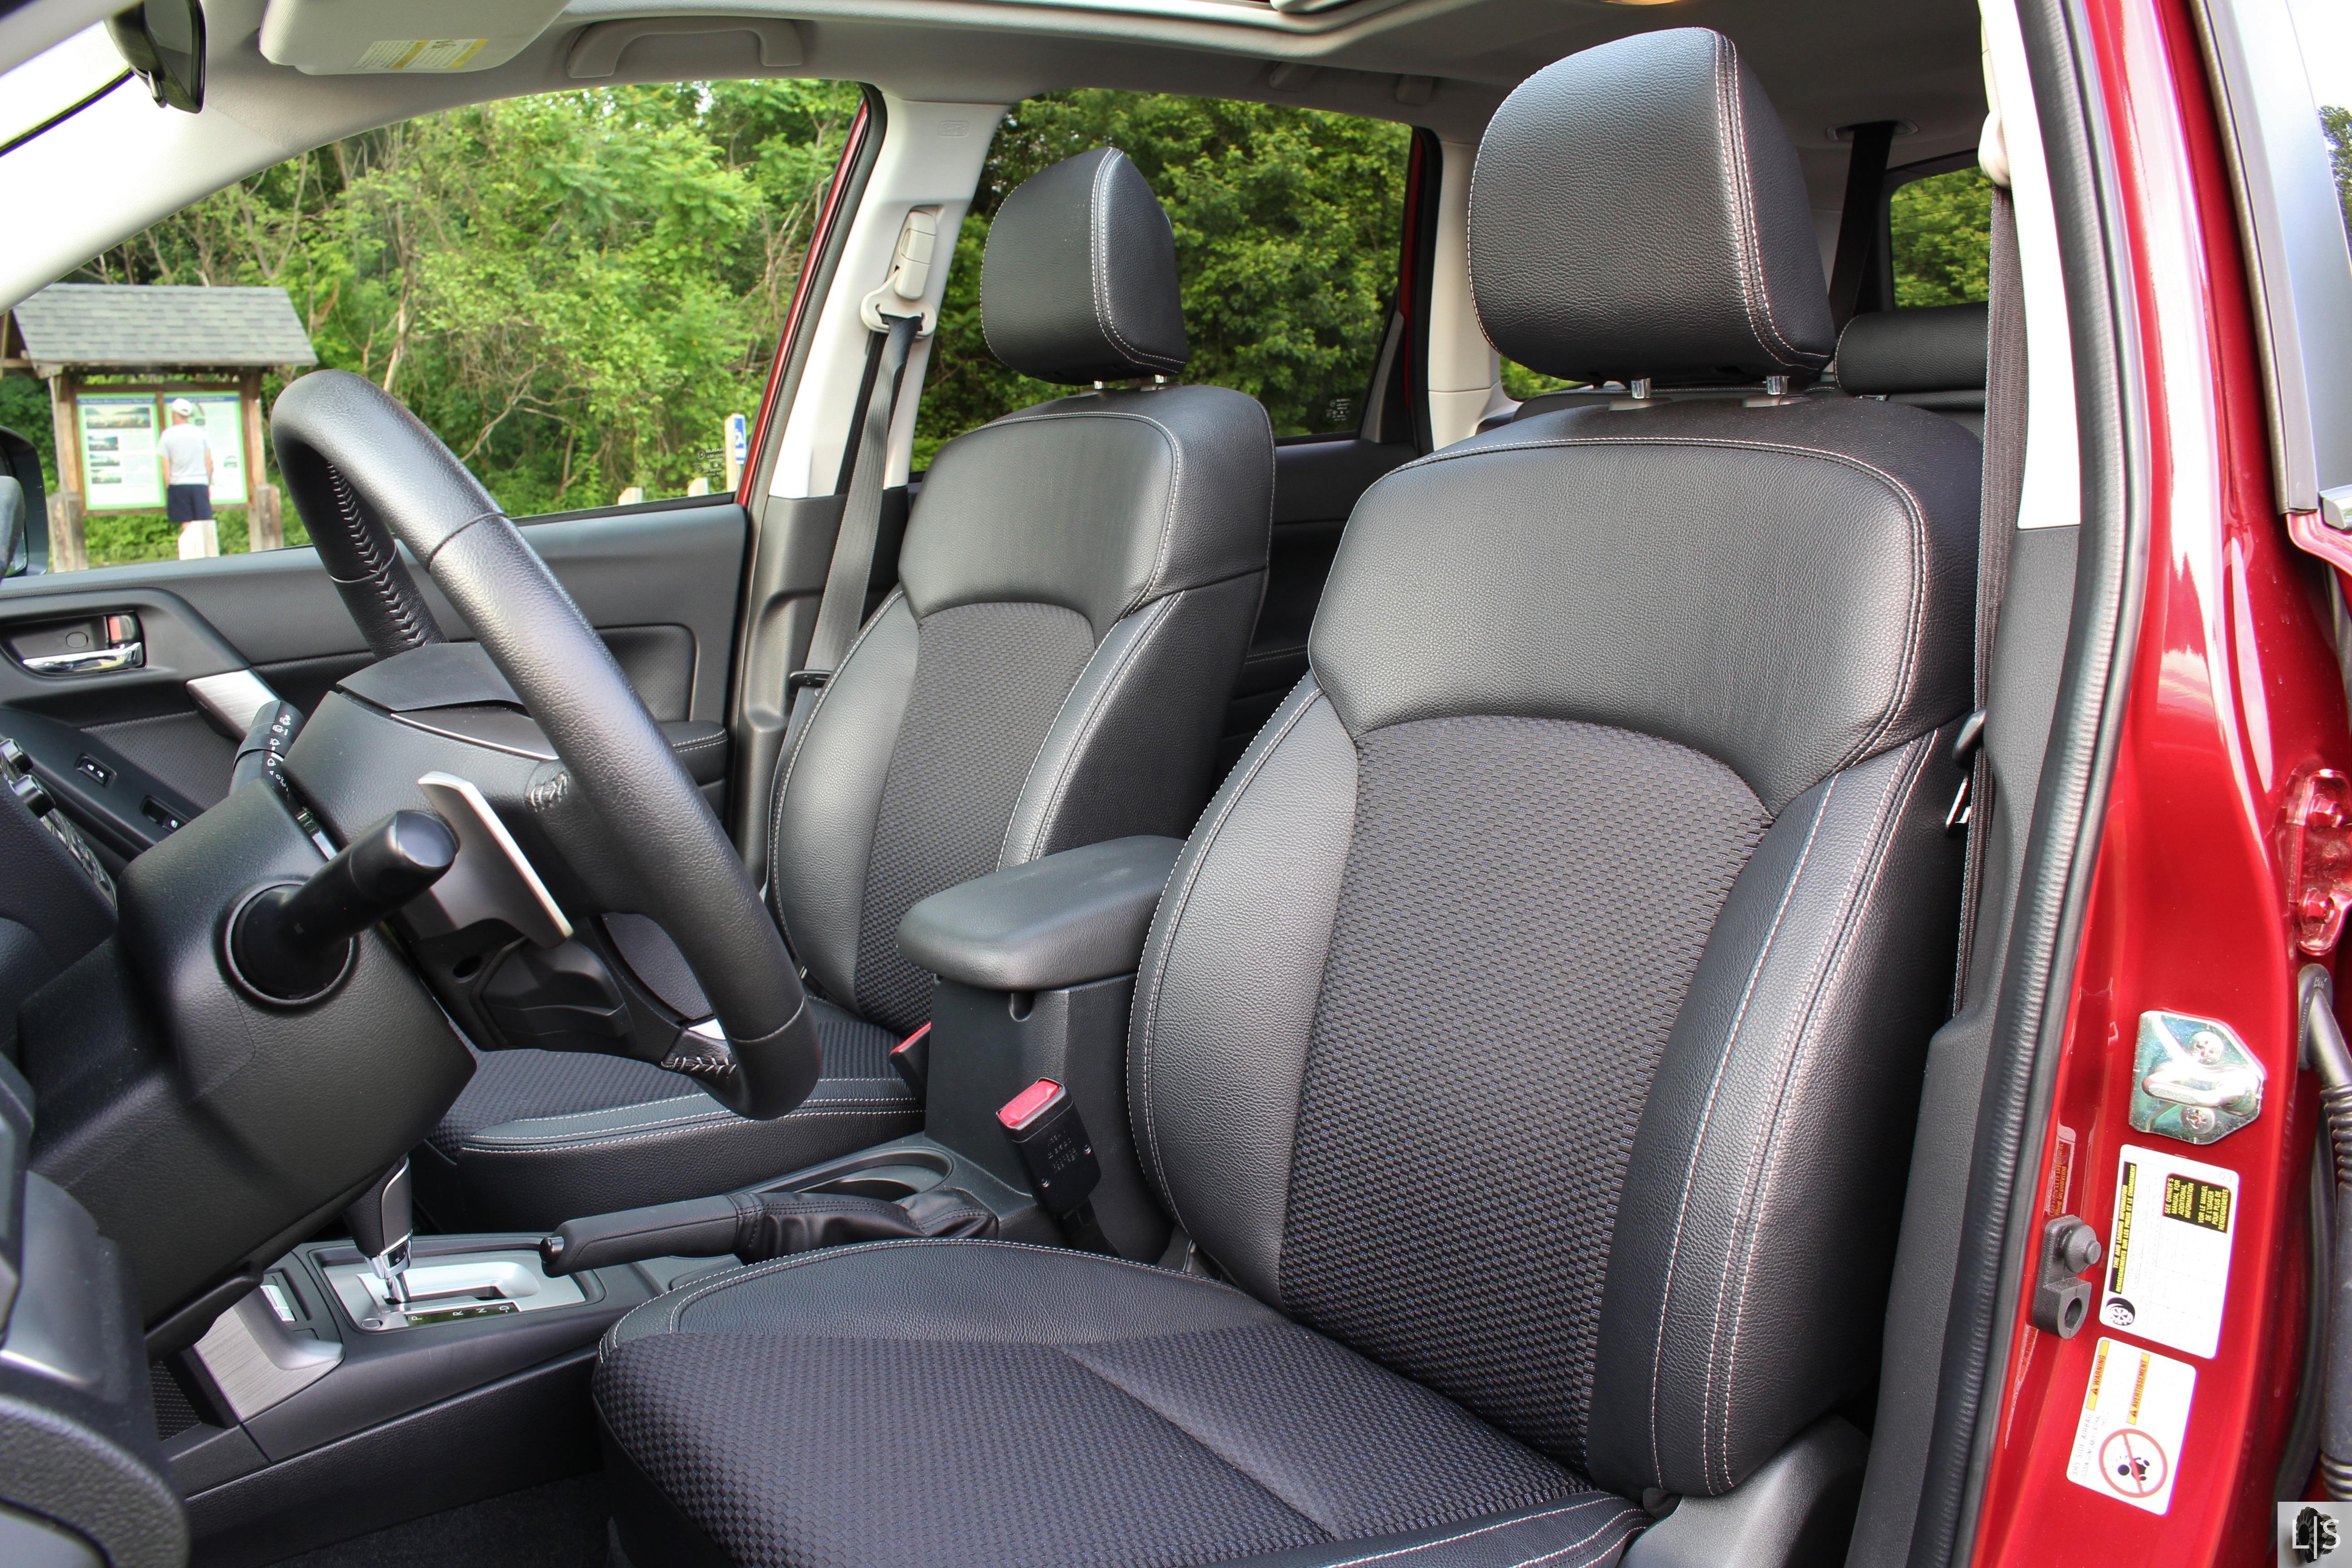 Utility 2014 Subaru Forester Xt Limited Slip Blog